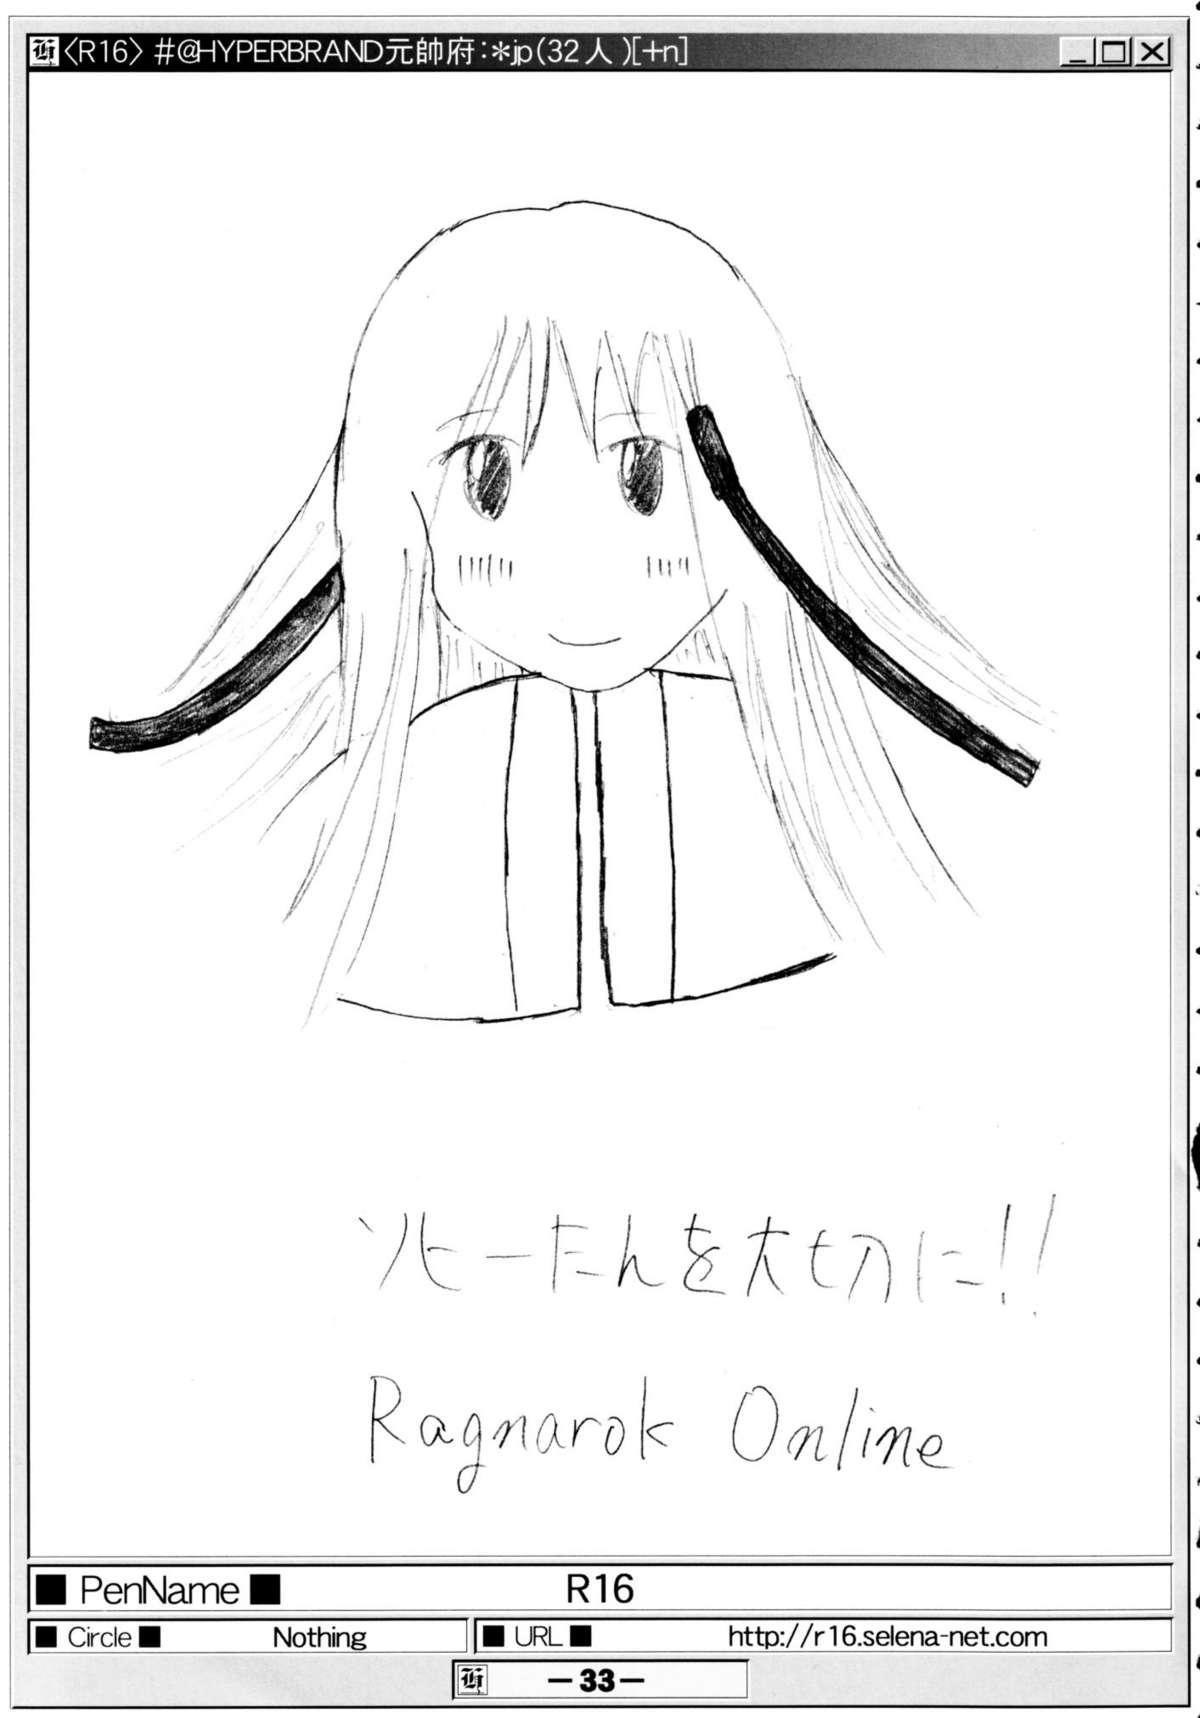 (Puniket 07) [HYPER BRAND (Deden, Ishihara Masumi, Kawamura Yasuhito)]  (Ragnarok Online) 31